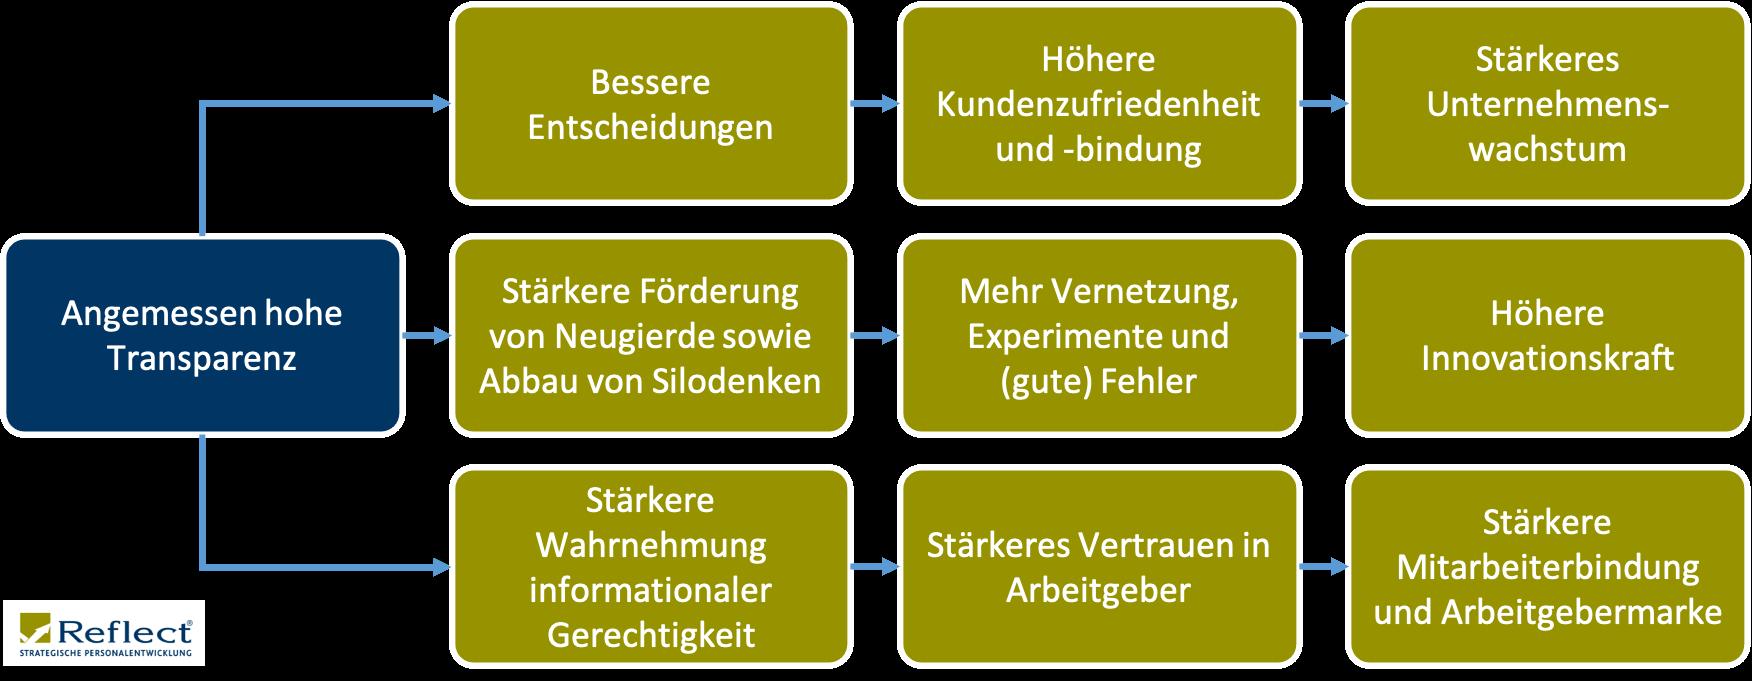 Grafik_Transparenz